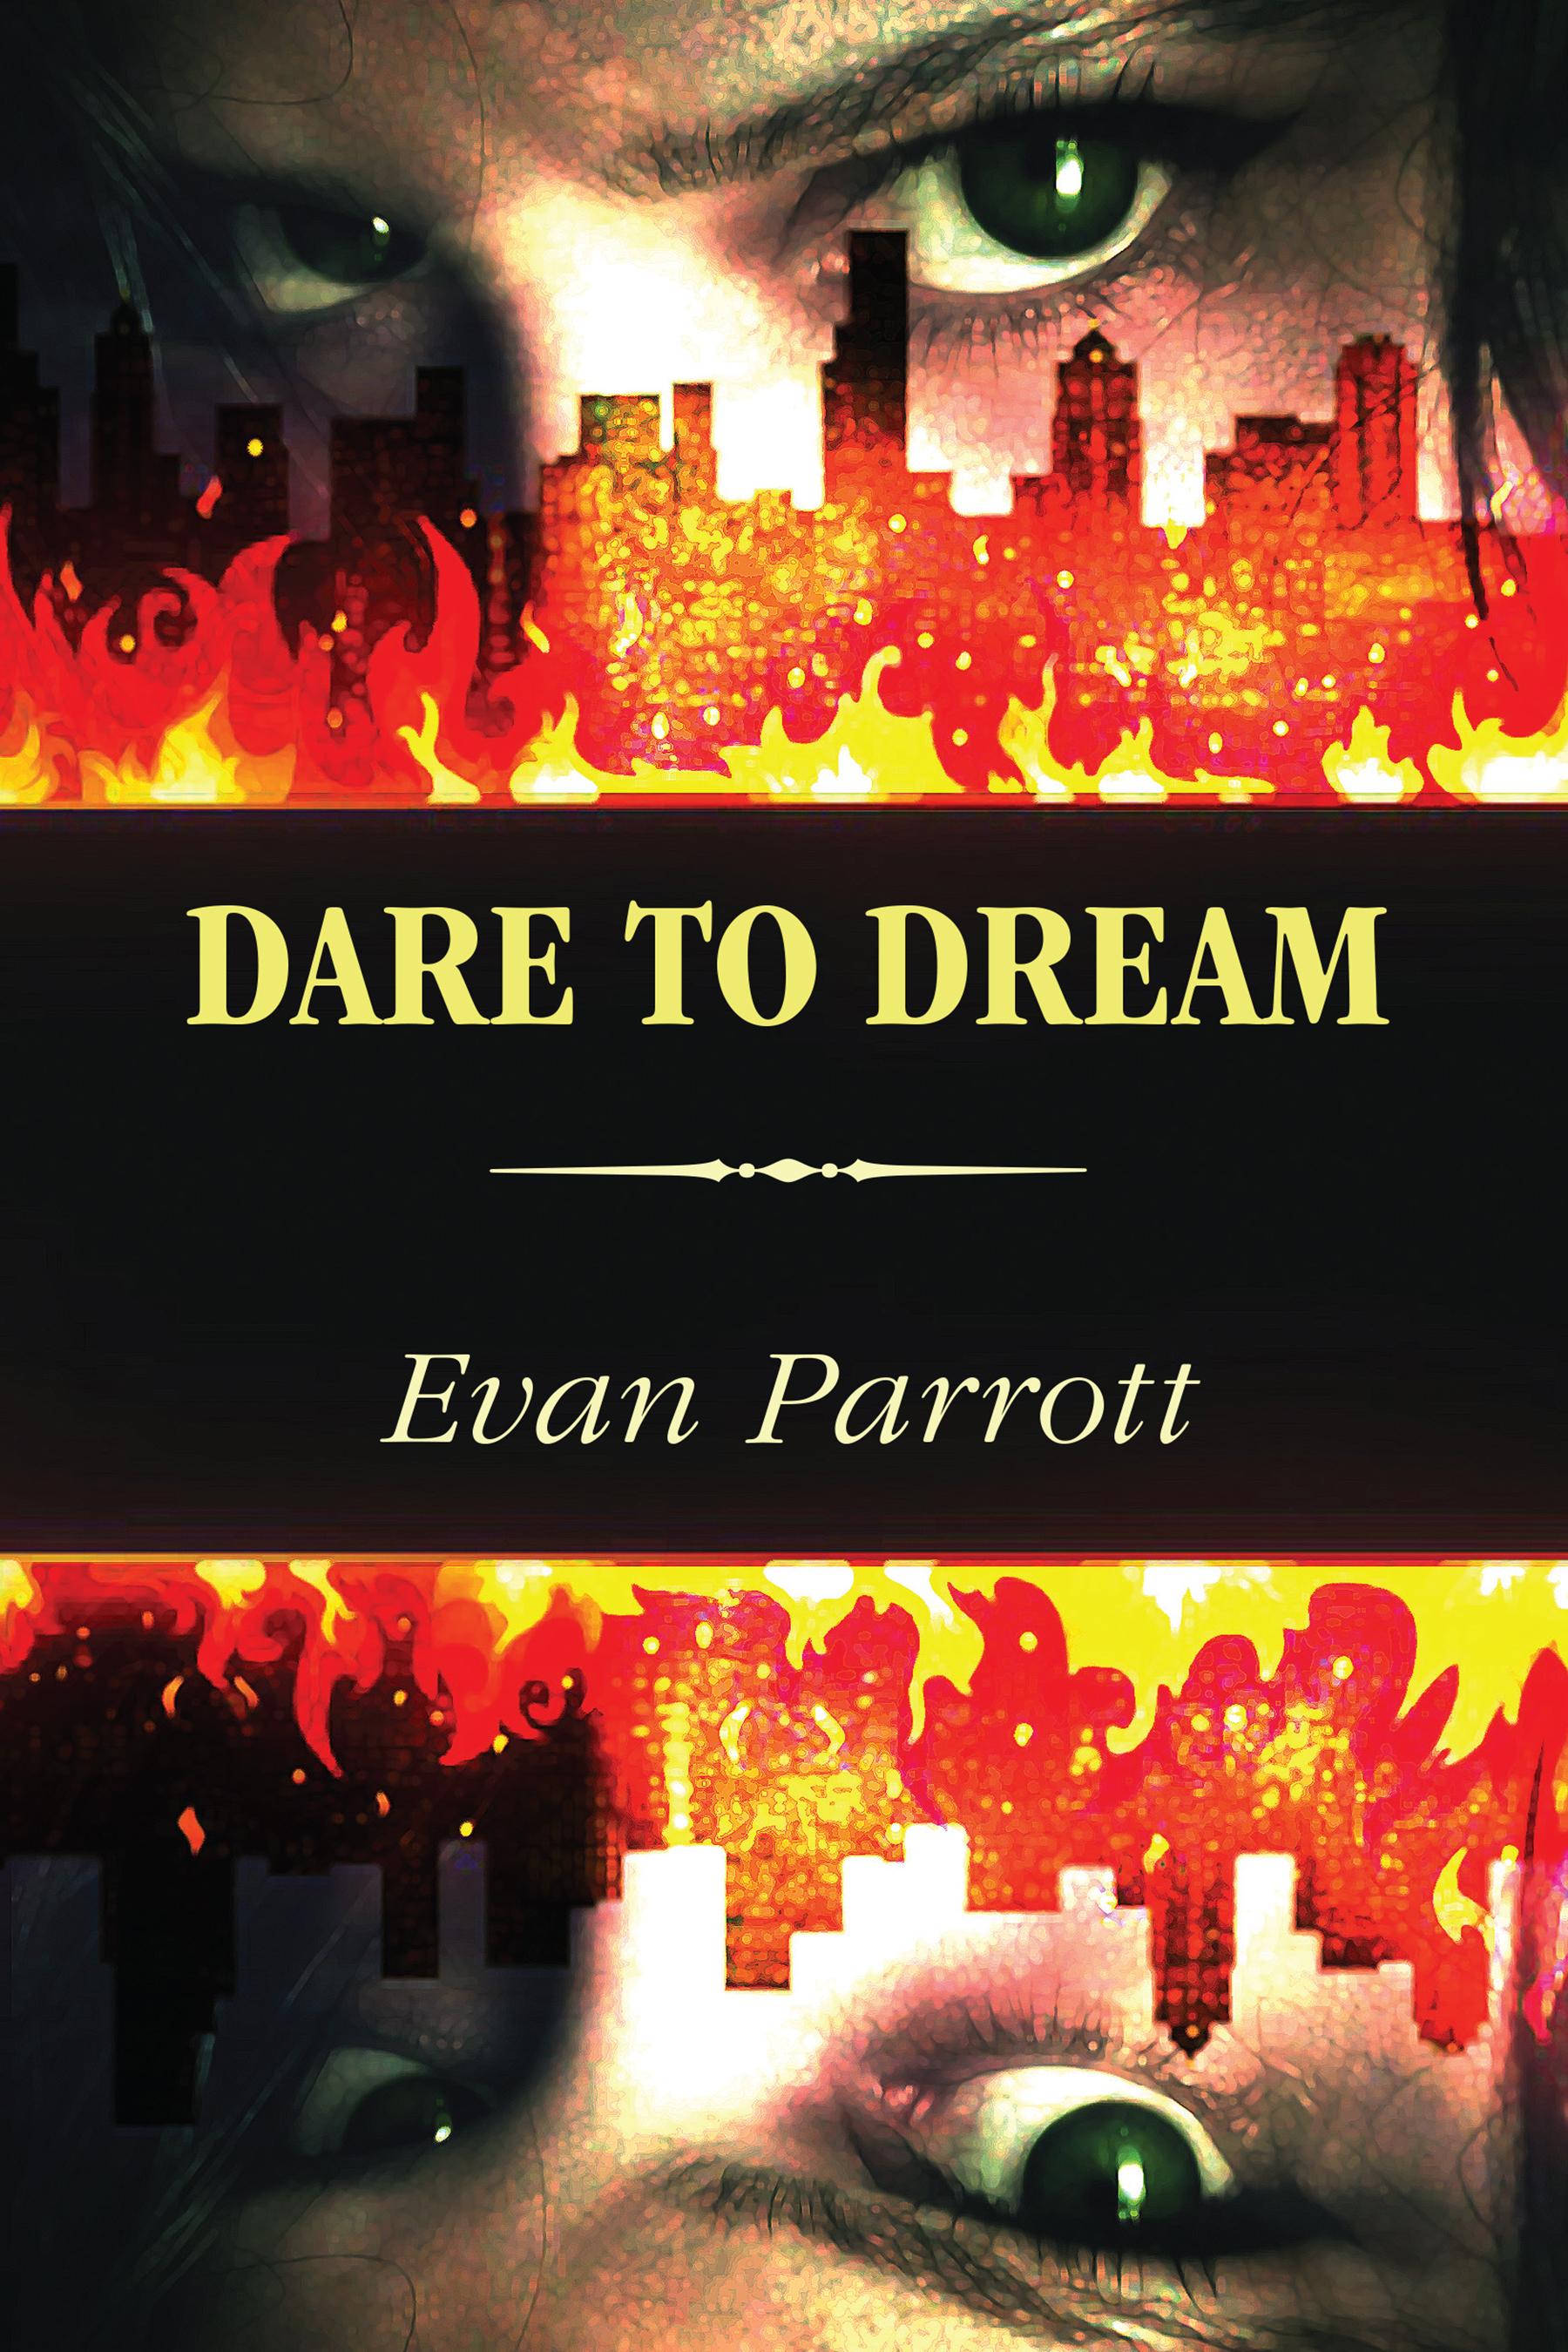 Dare to Dream by Evan Parrott